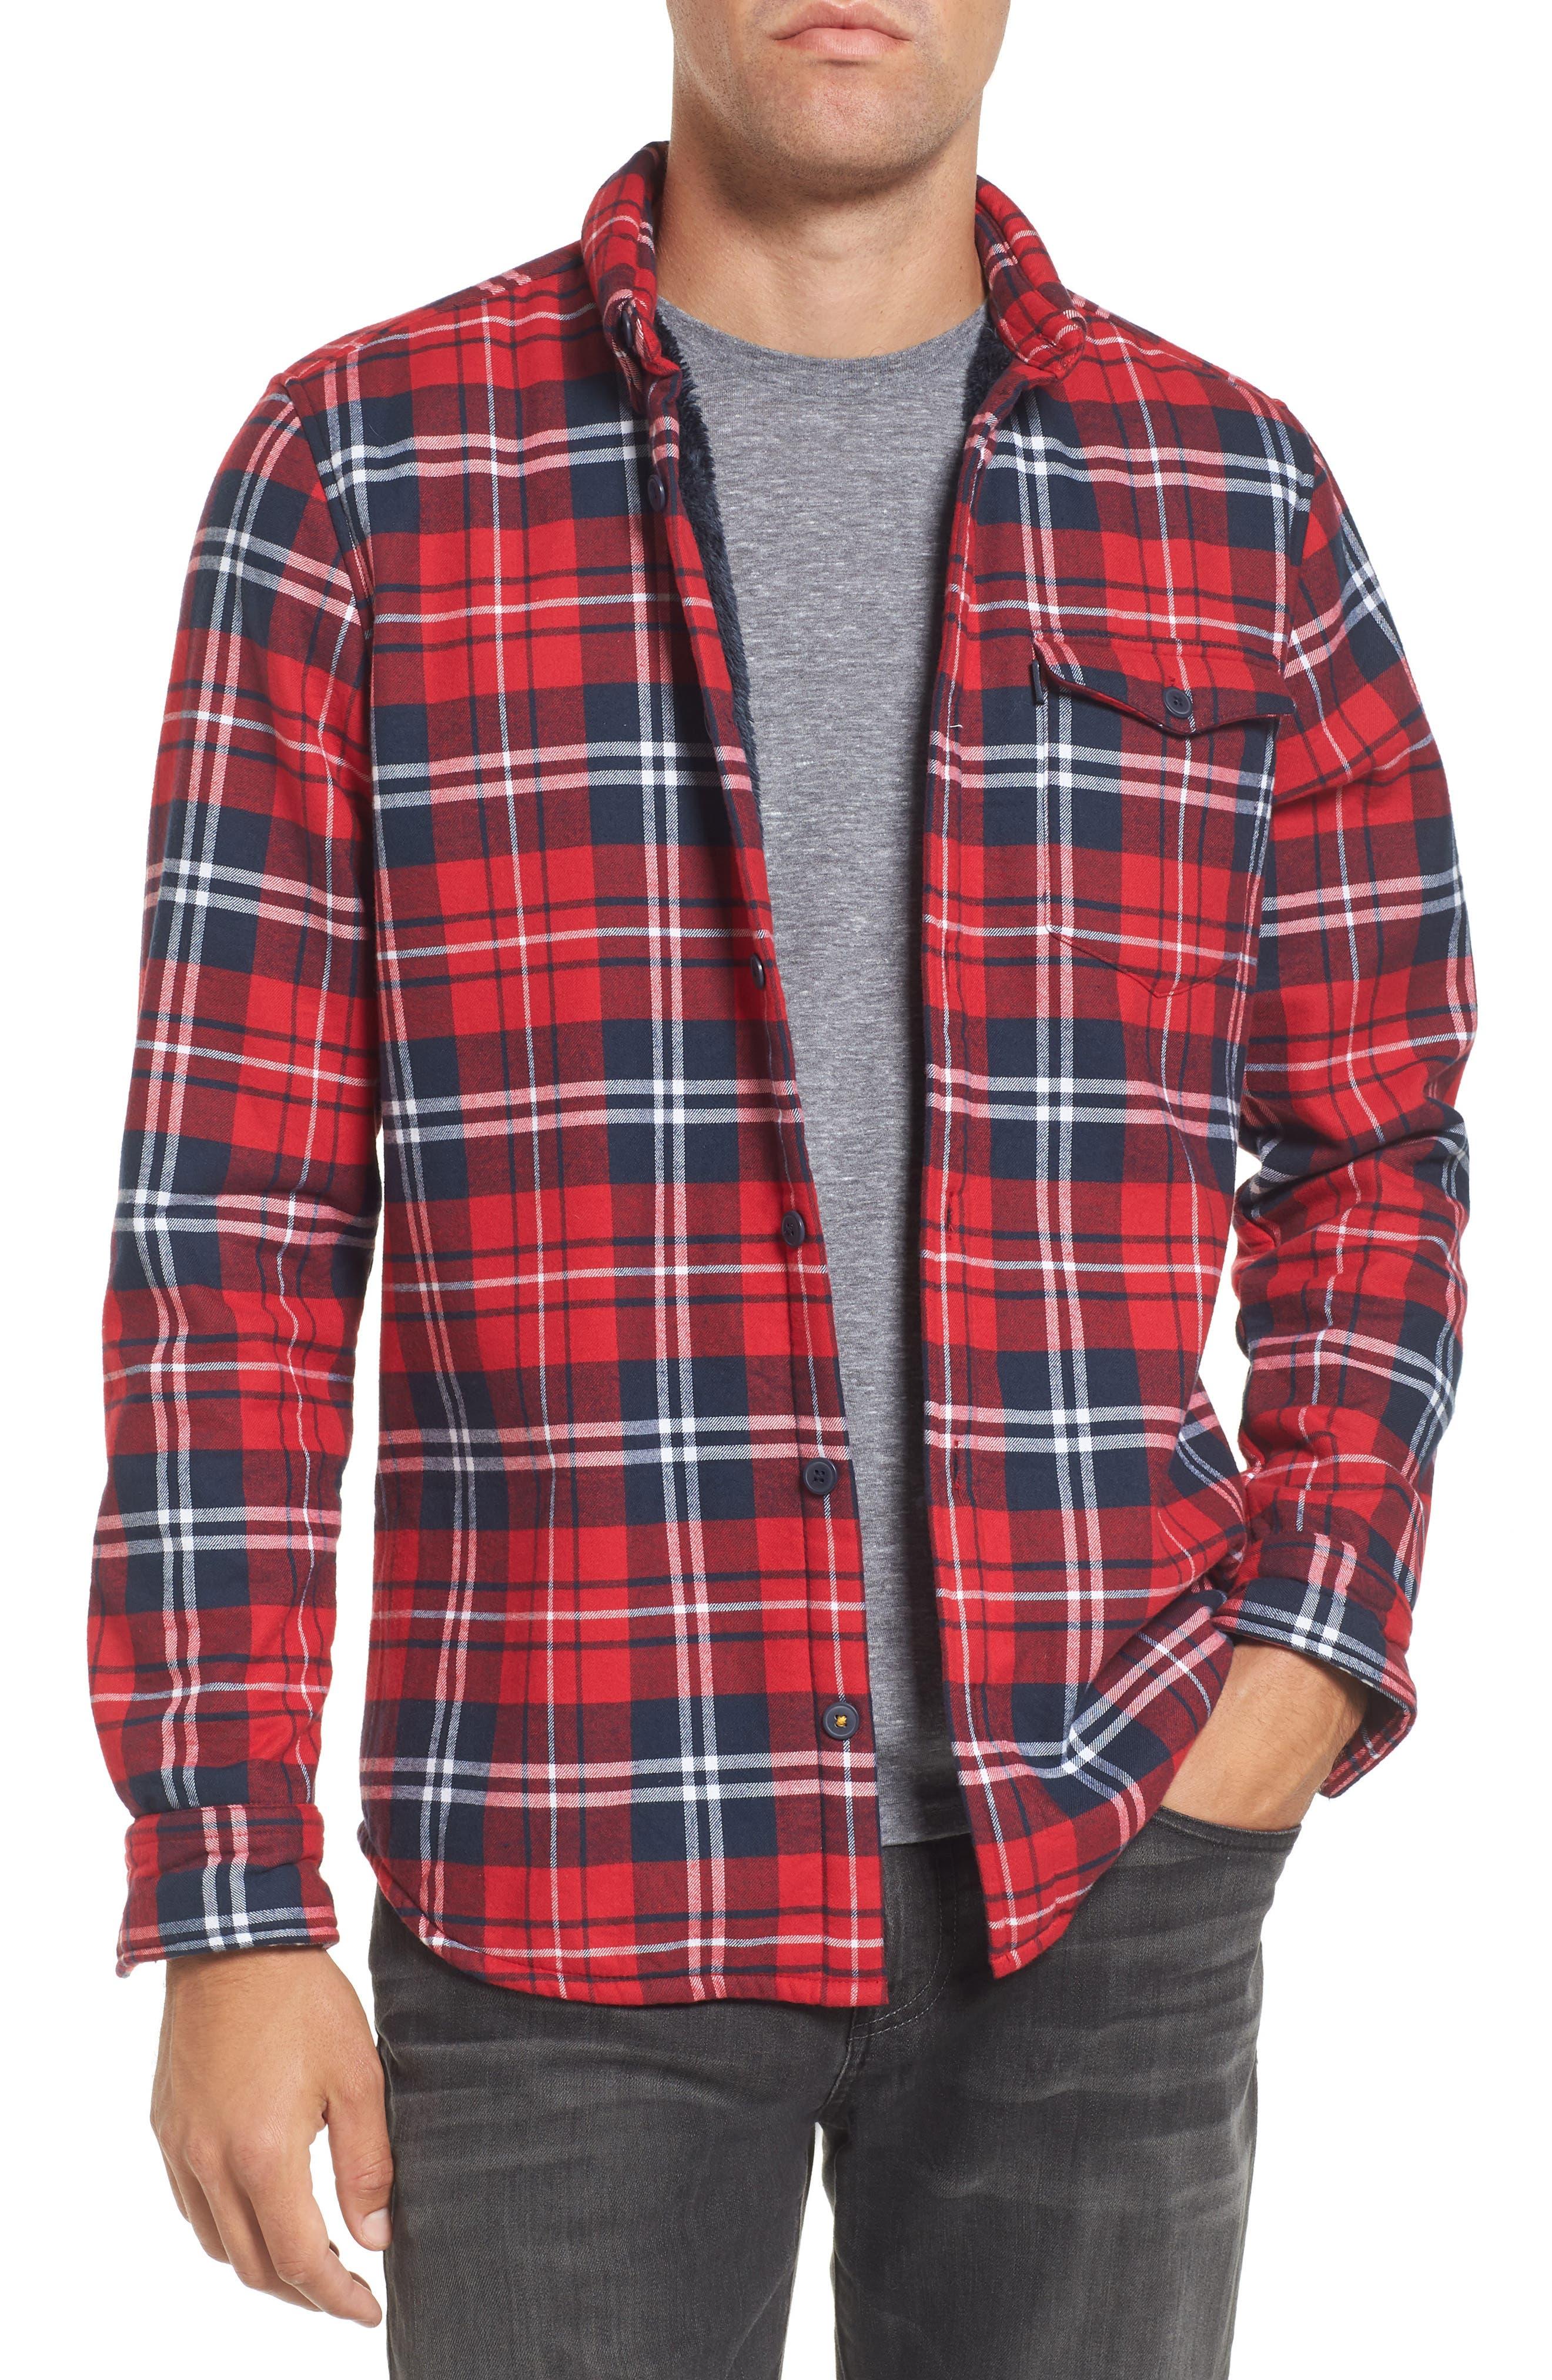 Alternate Image 1 Selected - Barbour Hamilton Regular Fit Faux Fur Lined Shirt Jacket